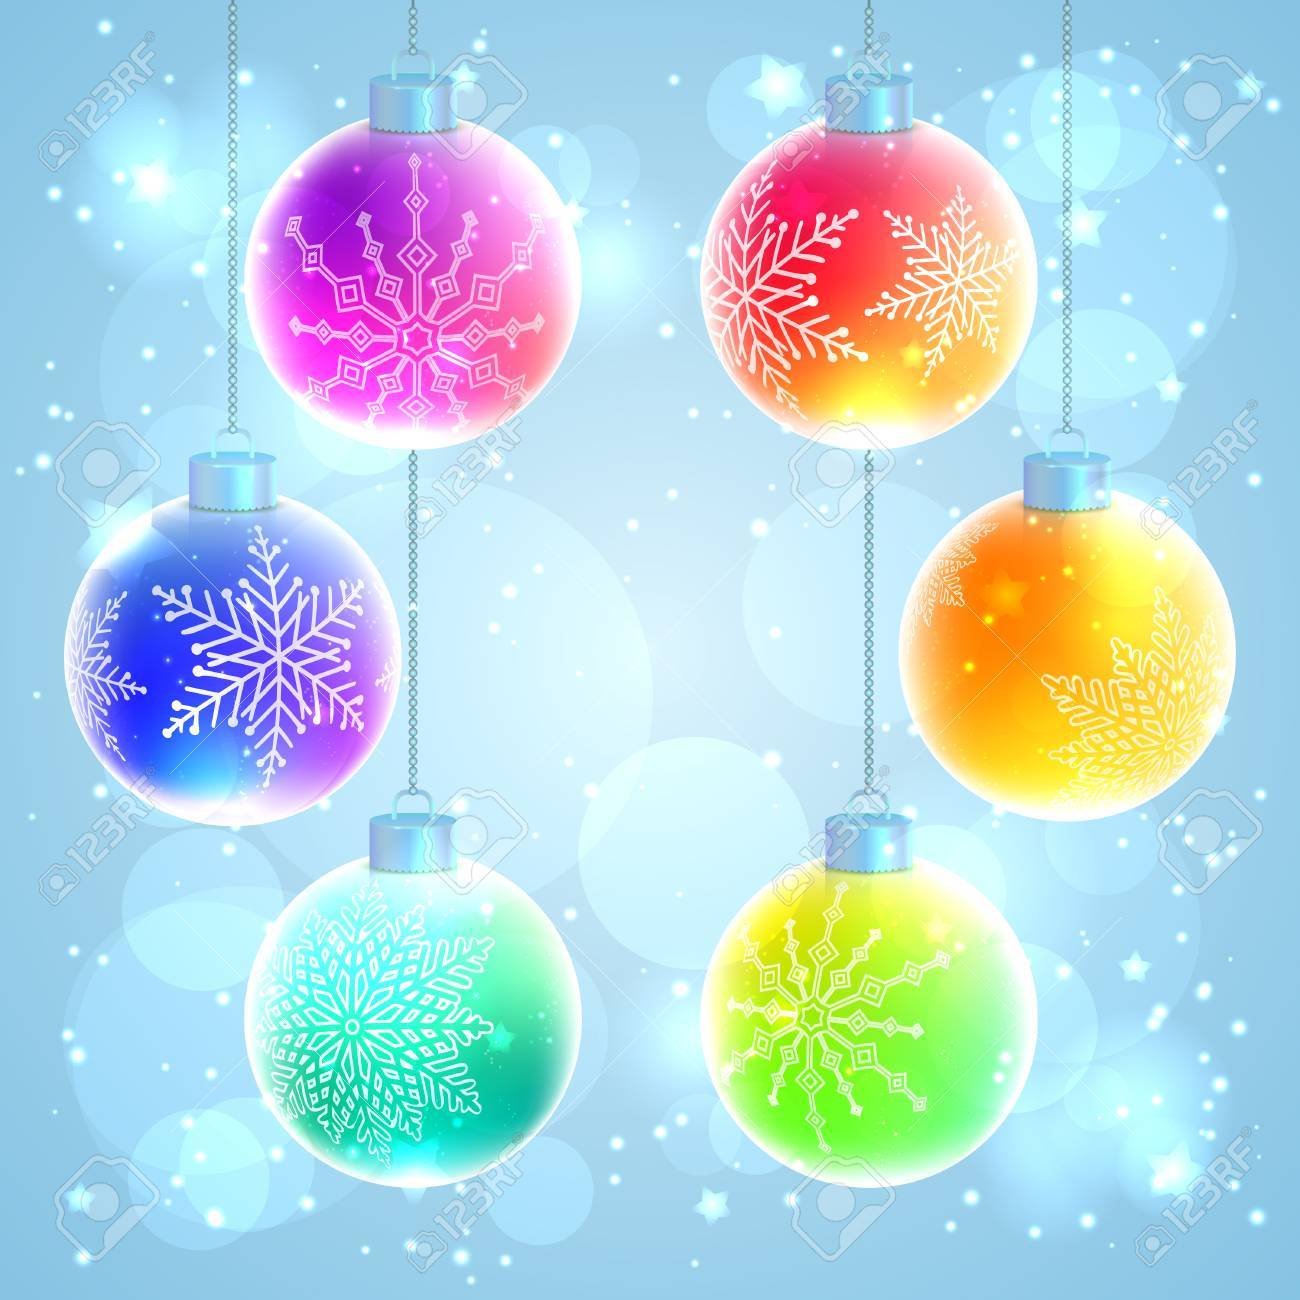 Set Of Six Colorful Rainbow Christmas Balls With Snowflake Decorations